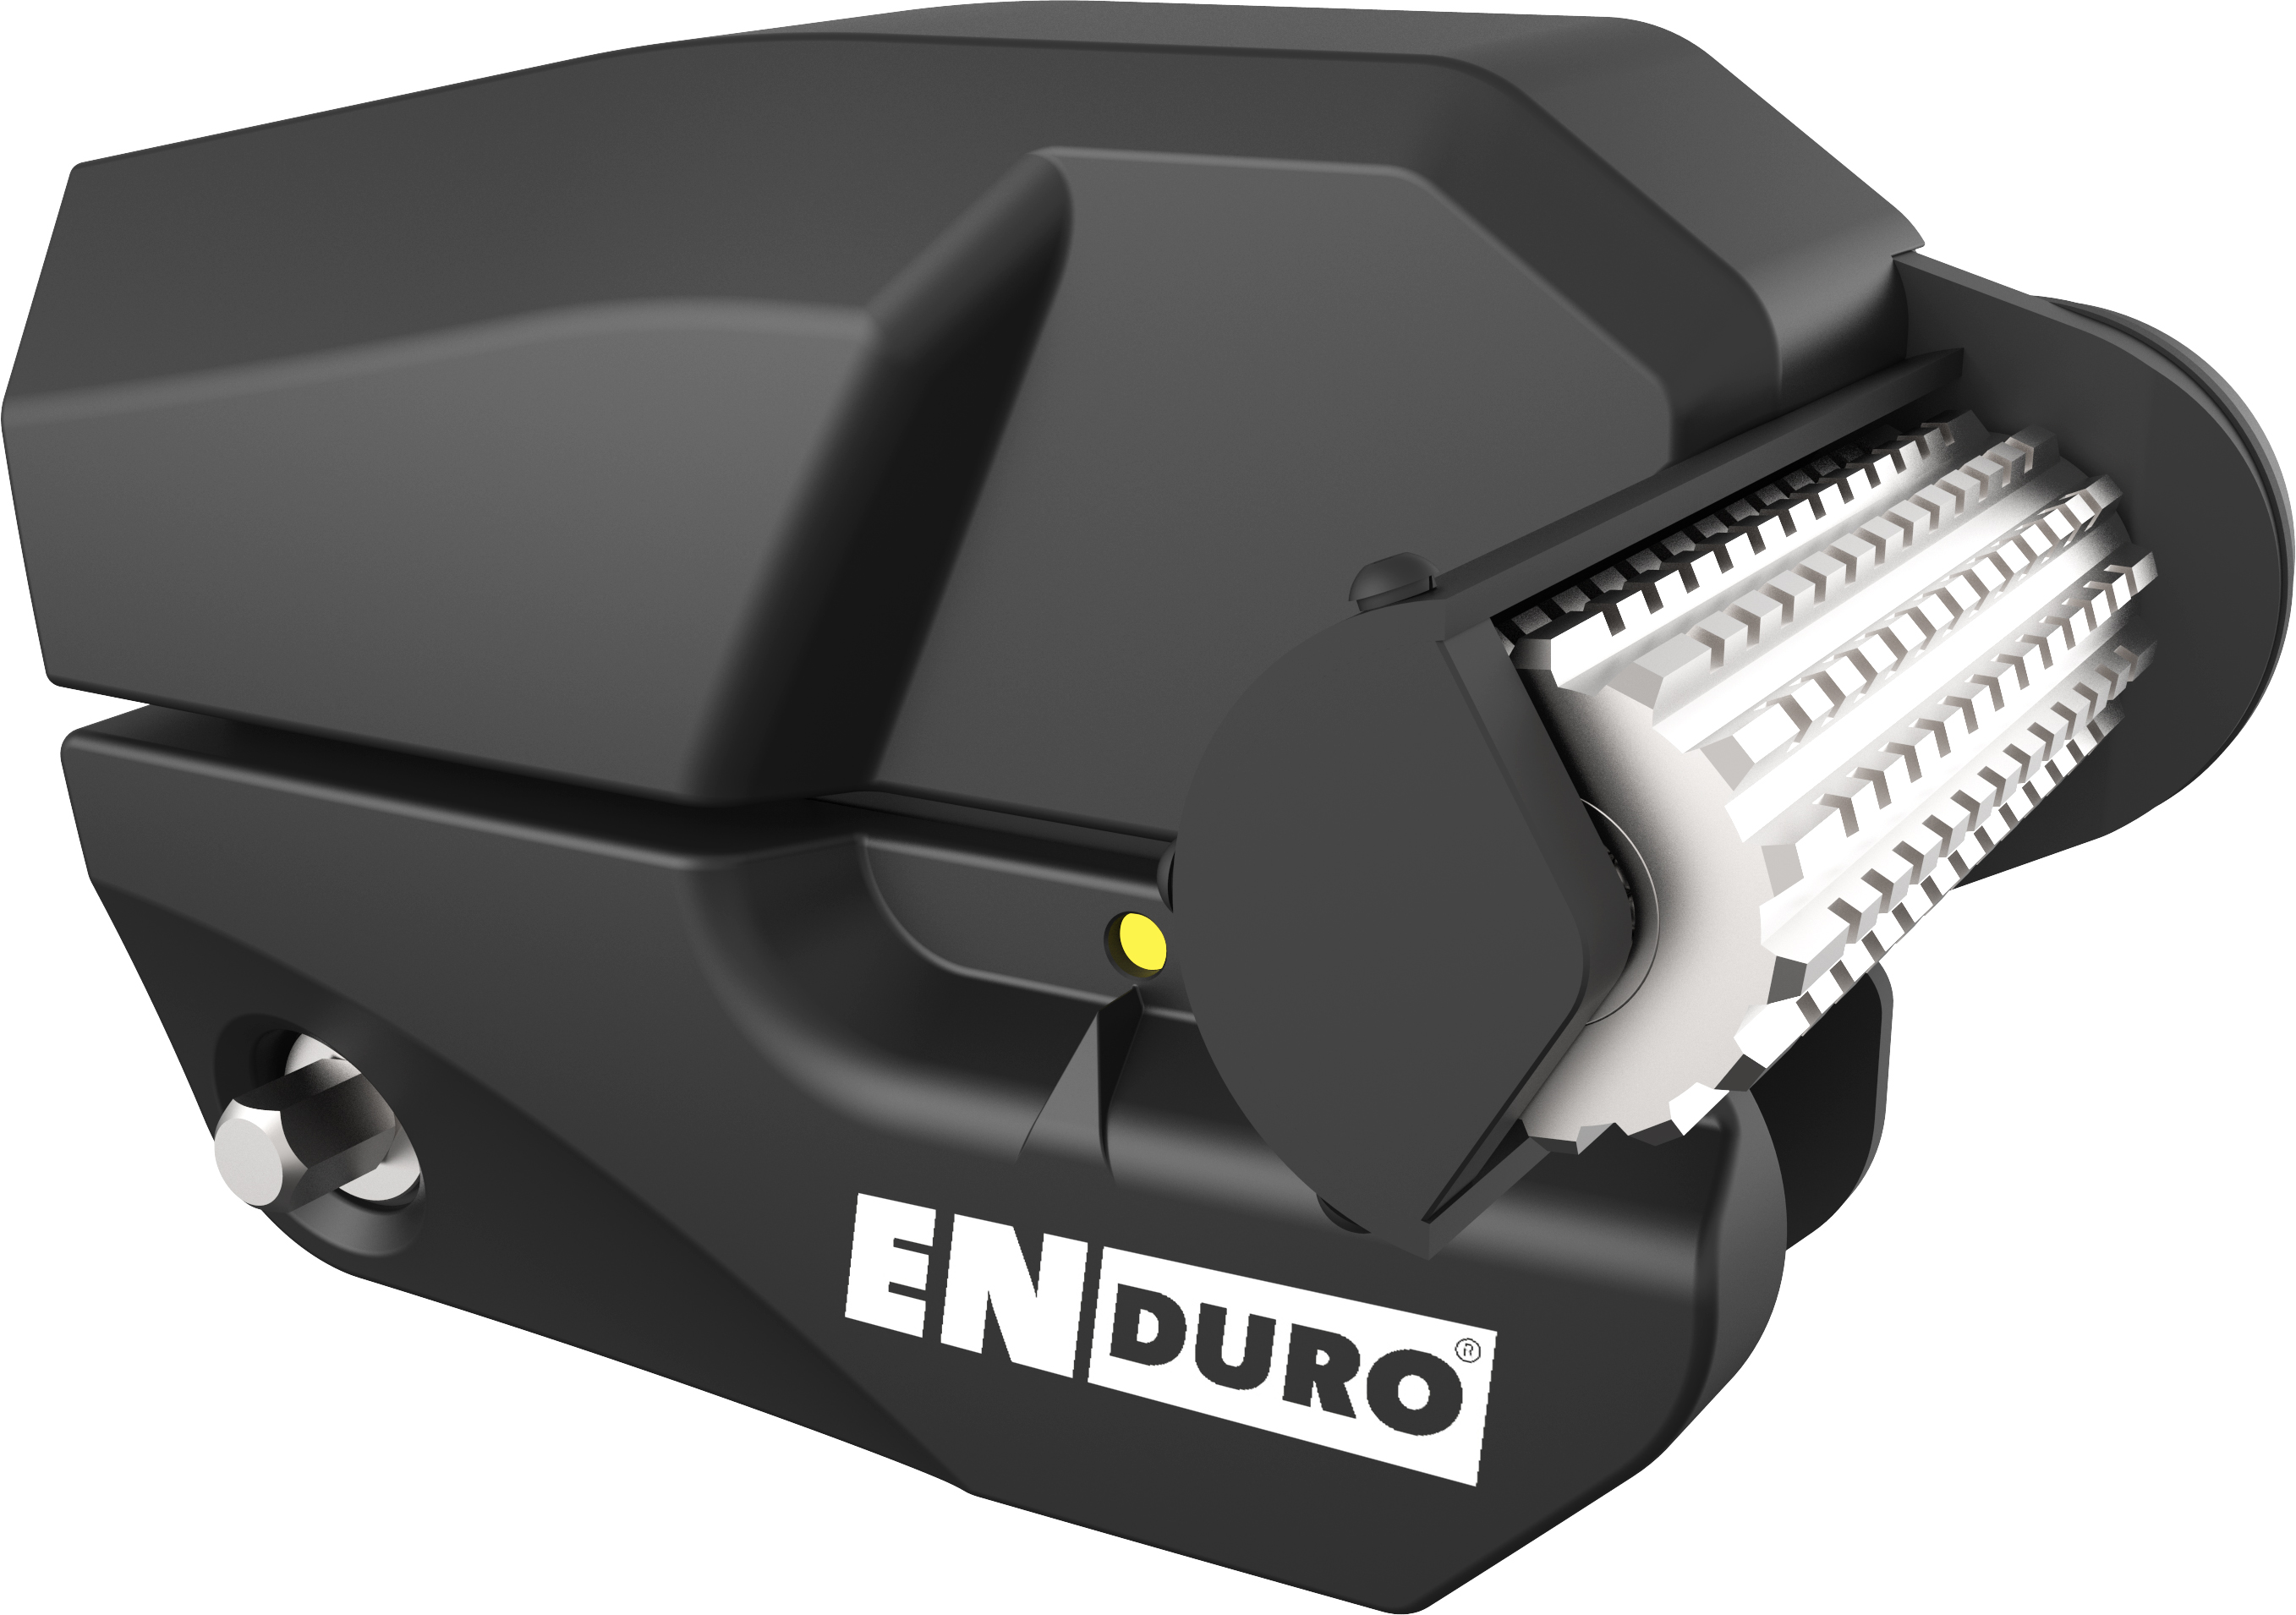 Enduro EM303 Image